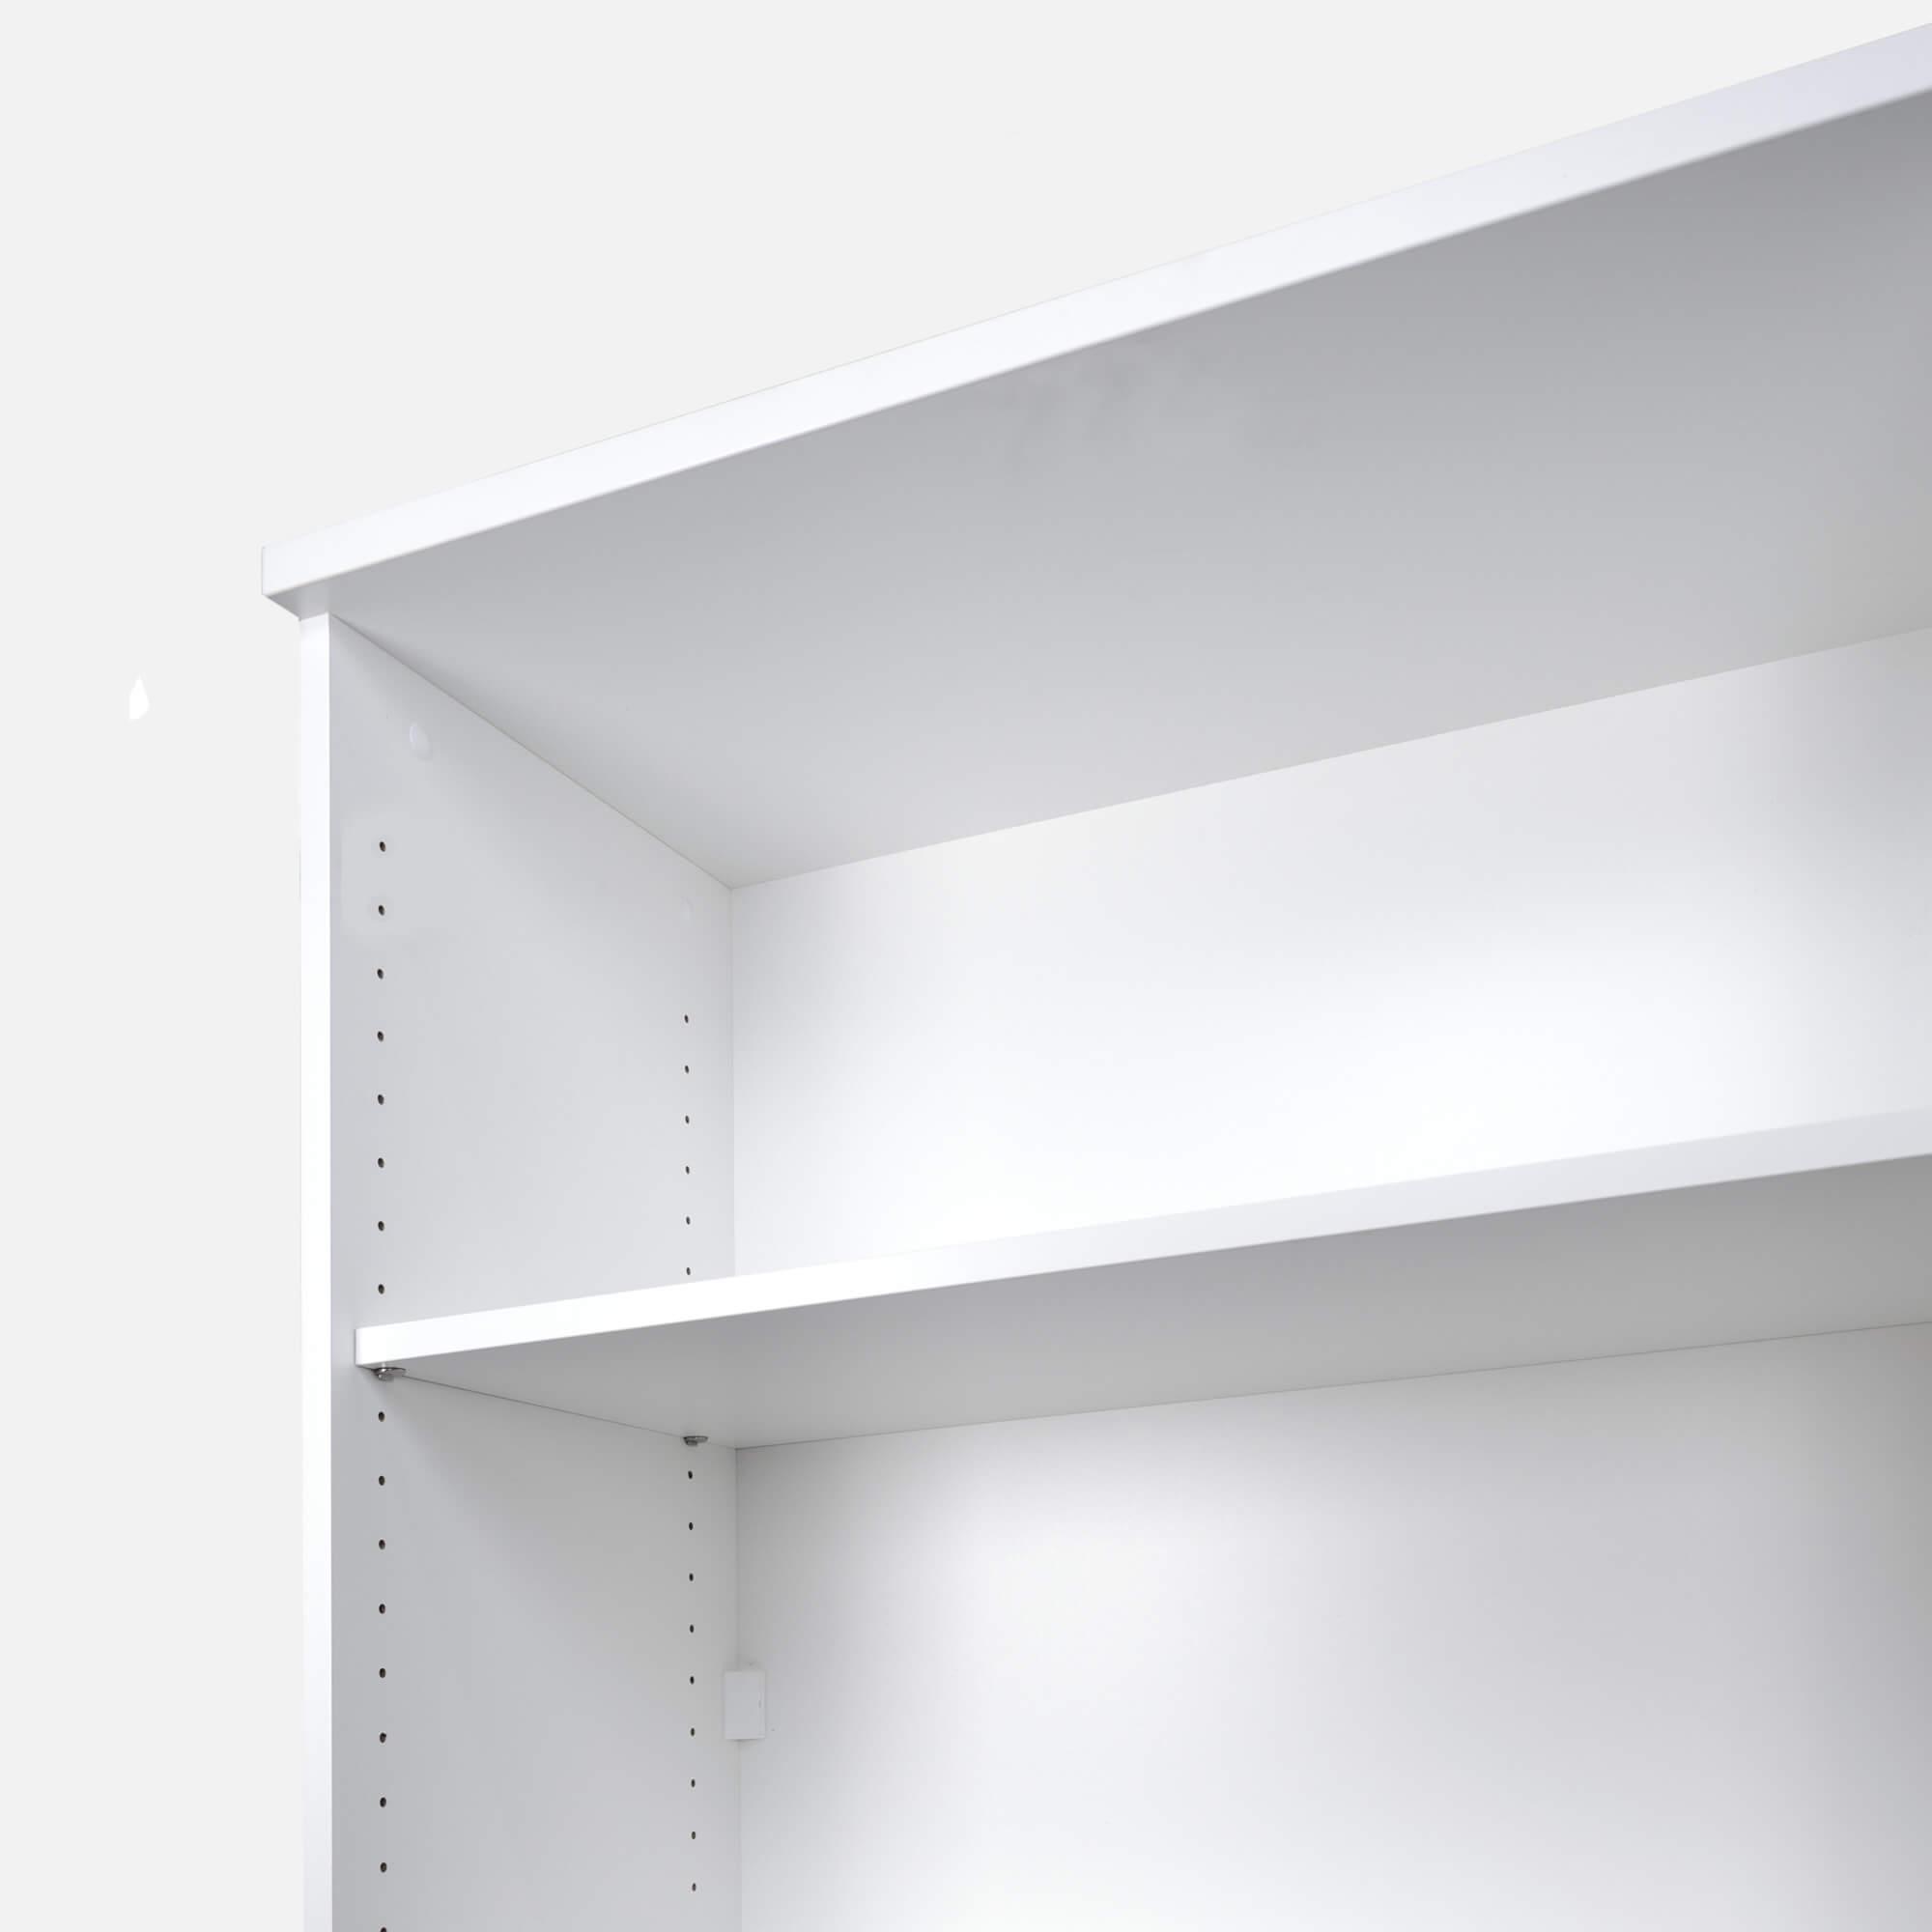 PROFI Bücherregal 5OH Regal Standregal Holzregal Wandregal Schrank Büro Weiß